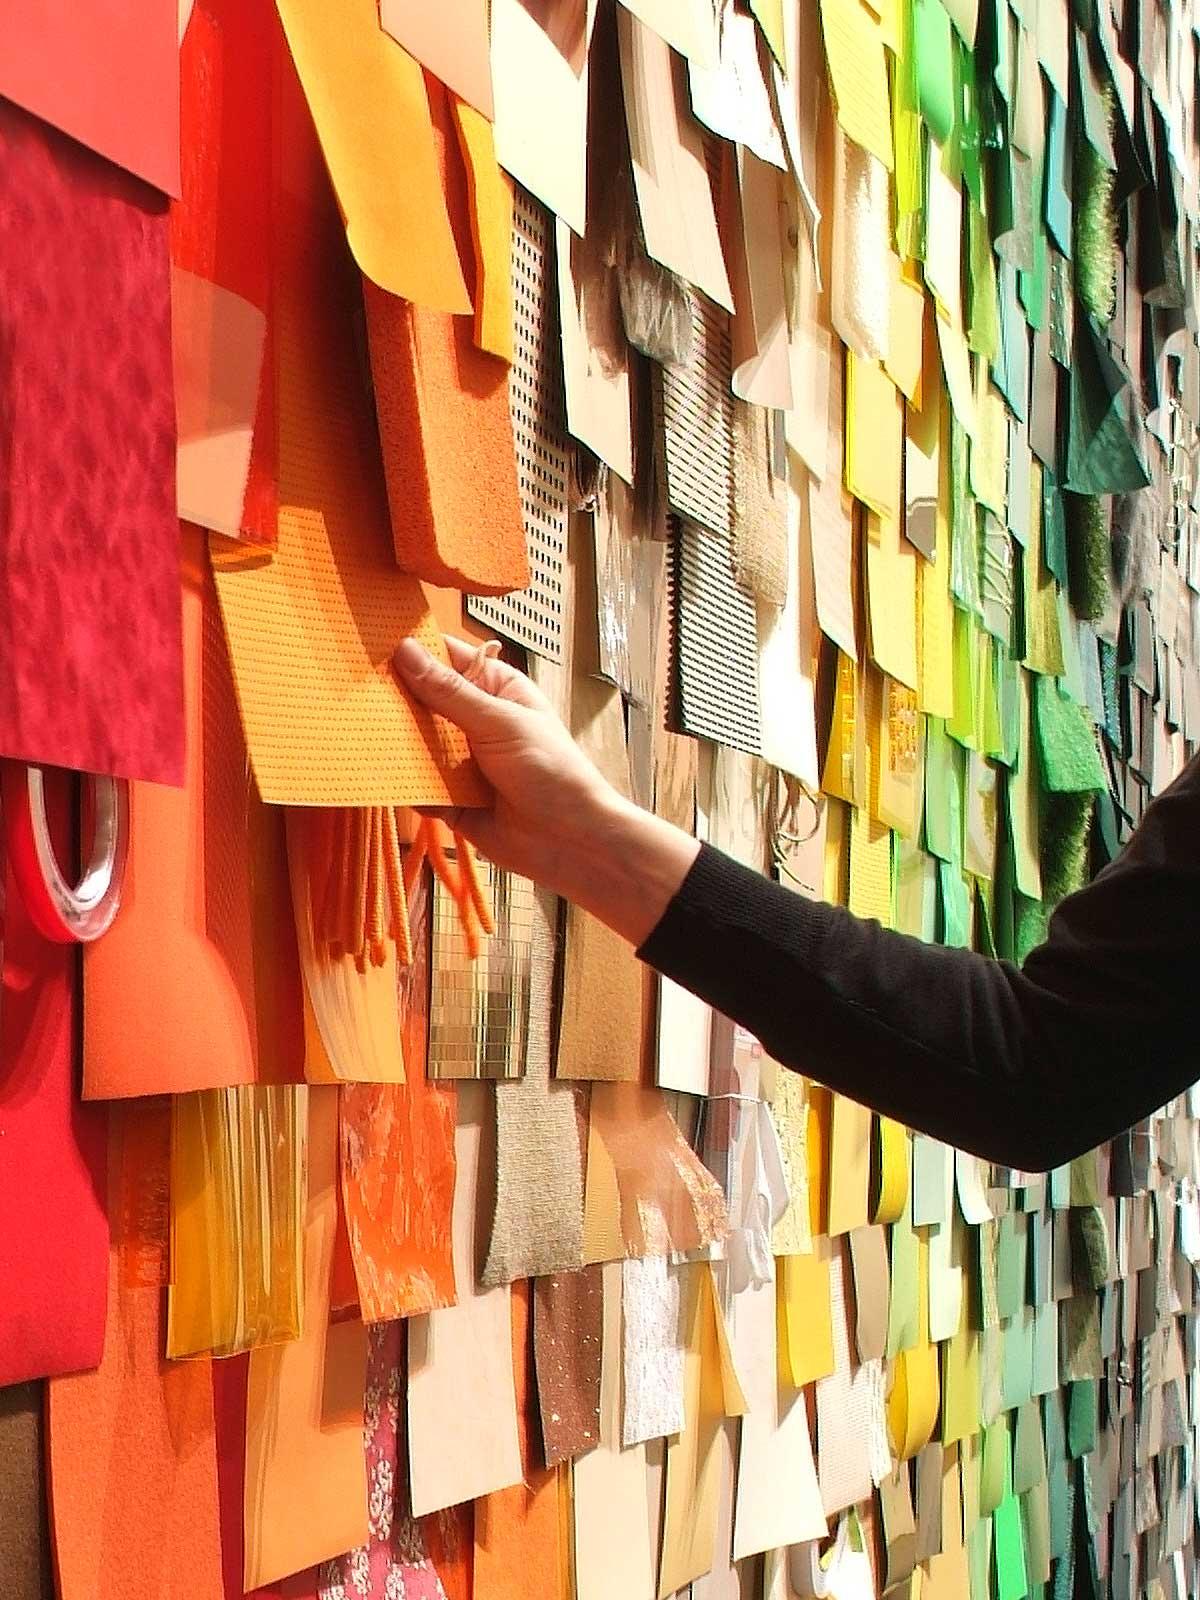 Modulor-material-Hand-total-messe-detail-wand-bunt-color-kreative-berlin-shop